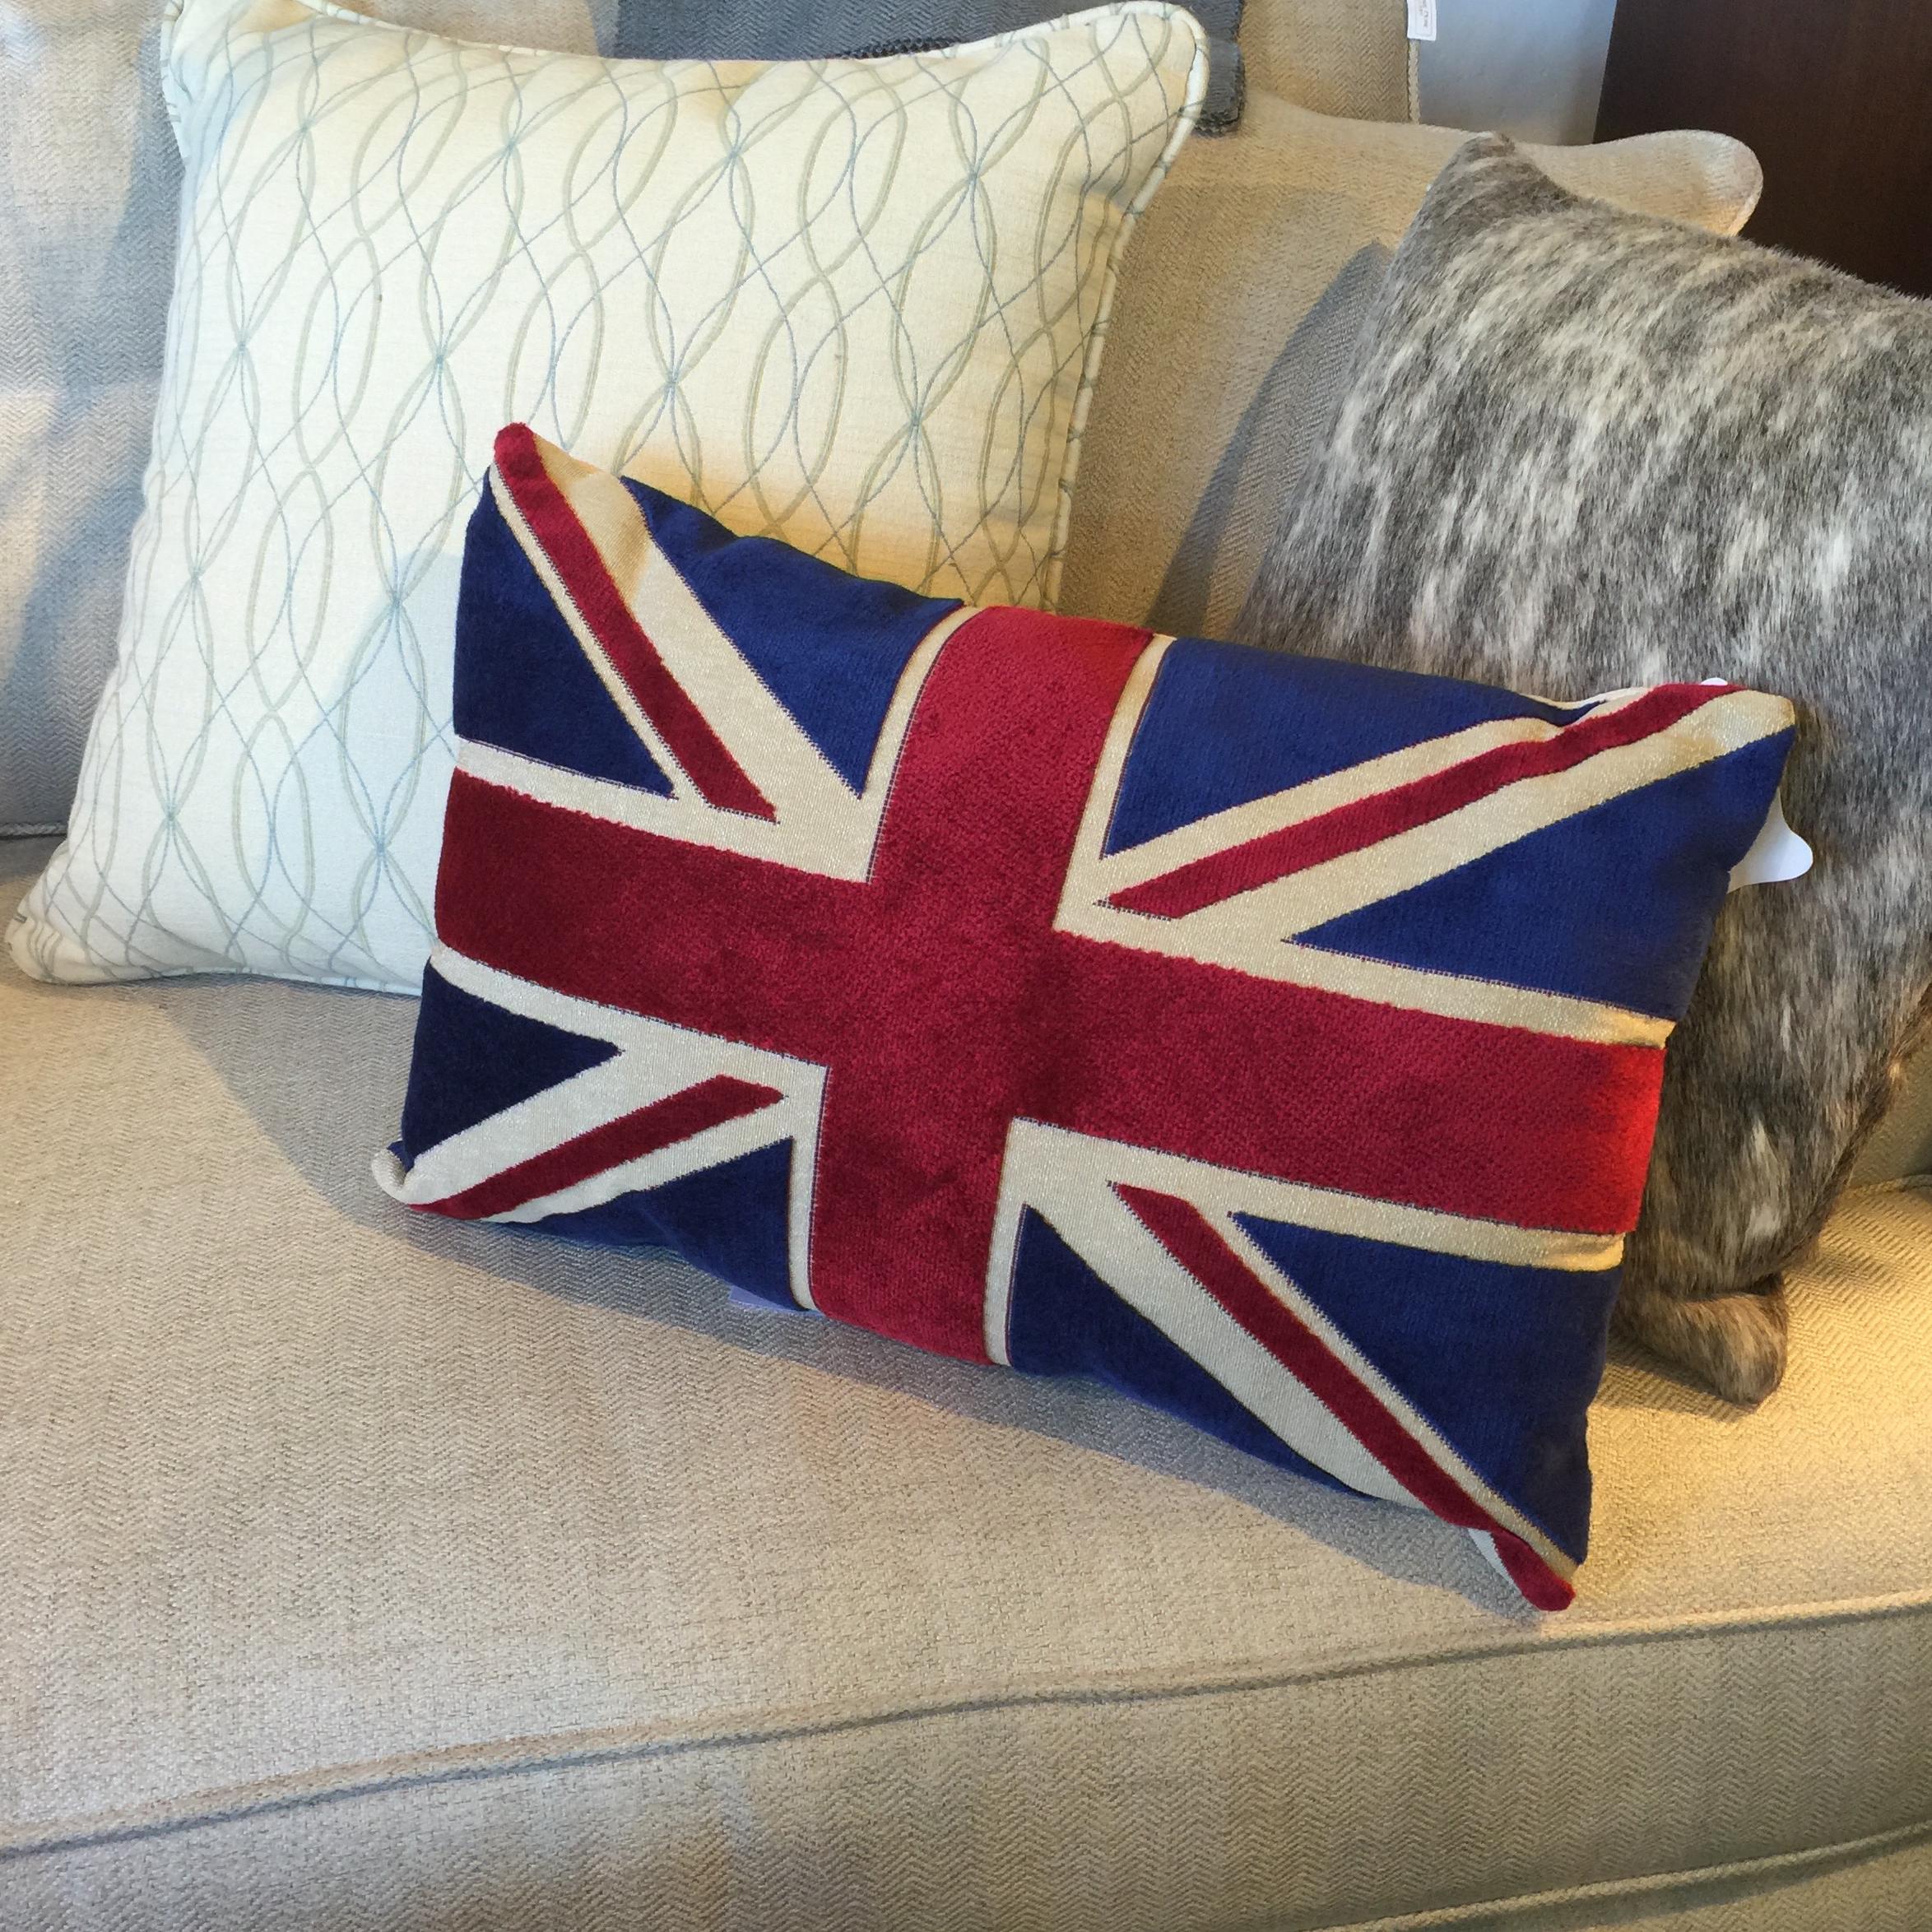 Superior Union Jack Flag Chenille Bolster Pillow   Image 2 Of 6 Amazing Ideas